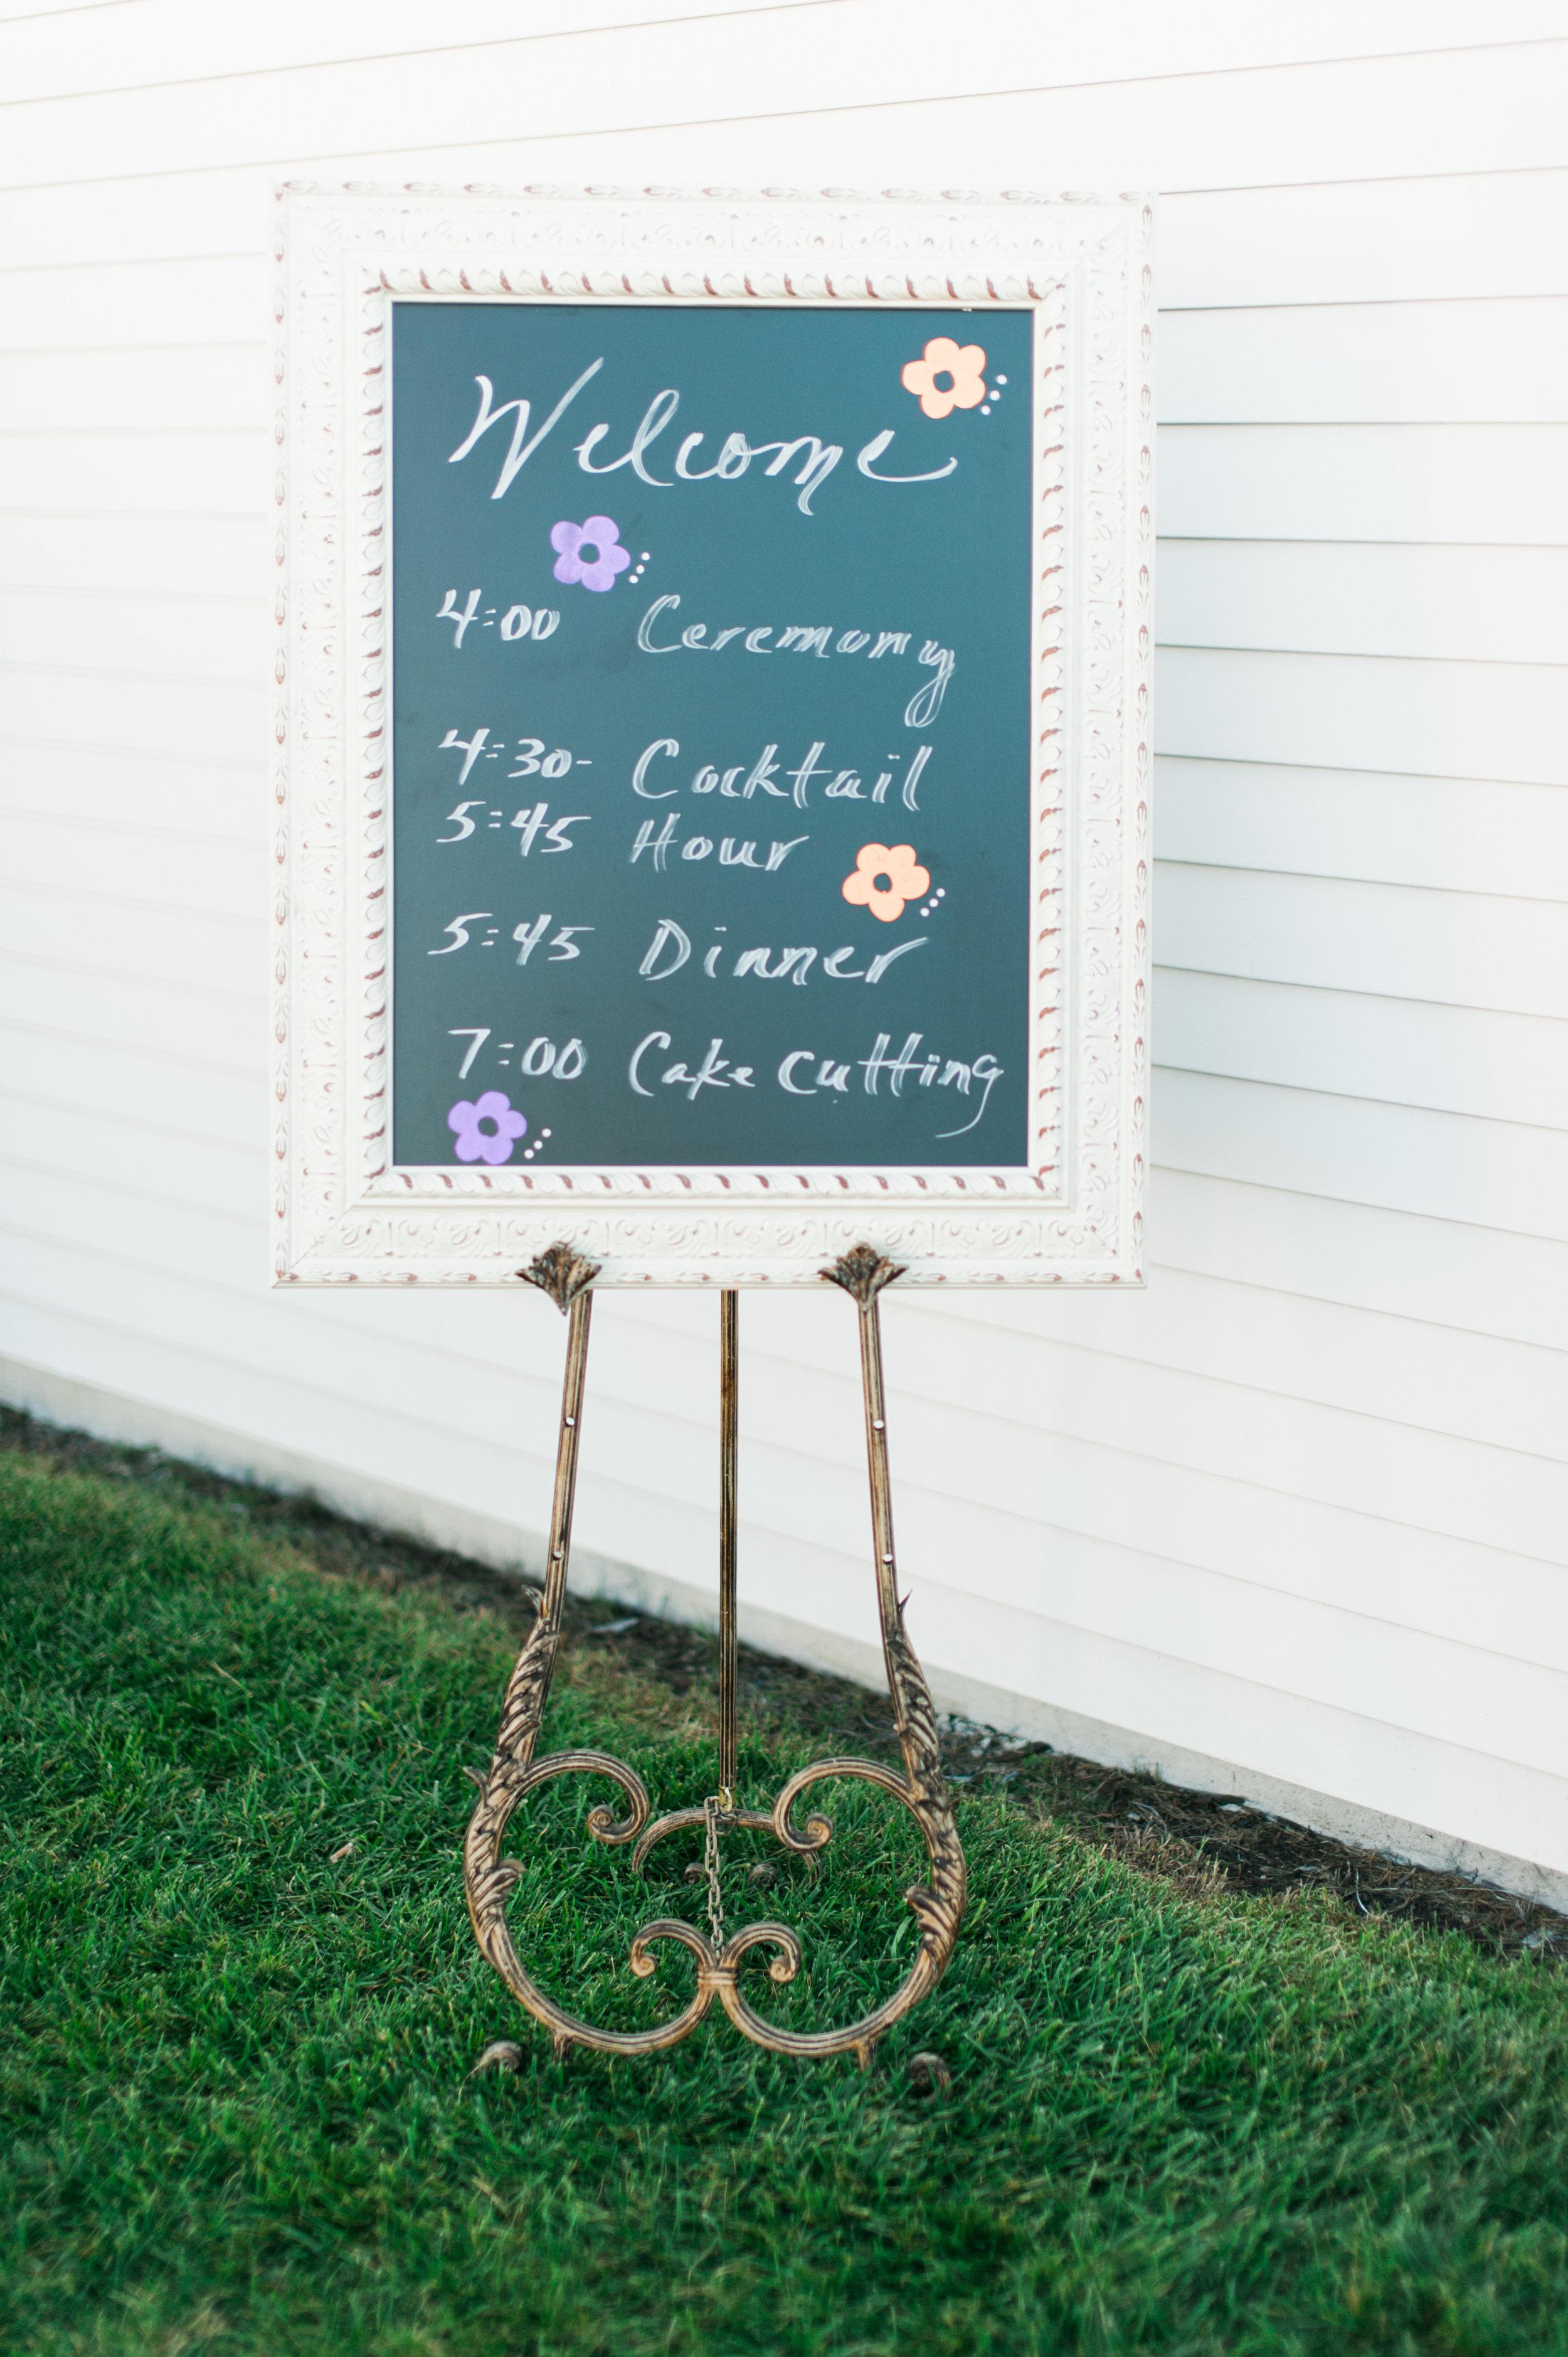 Omaha ceremony board, a cute detail for an Omaha wedding